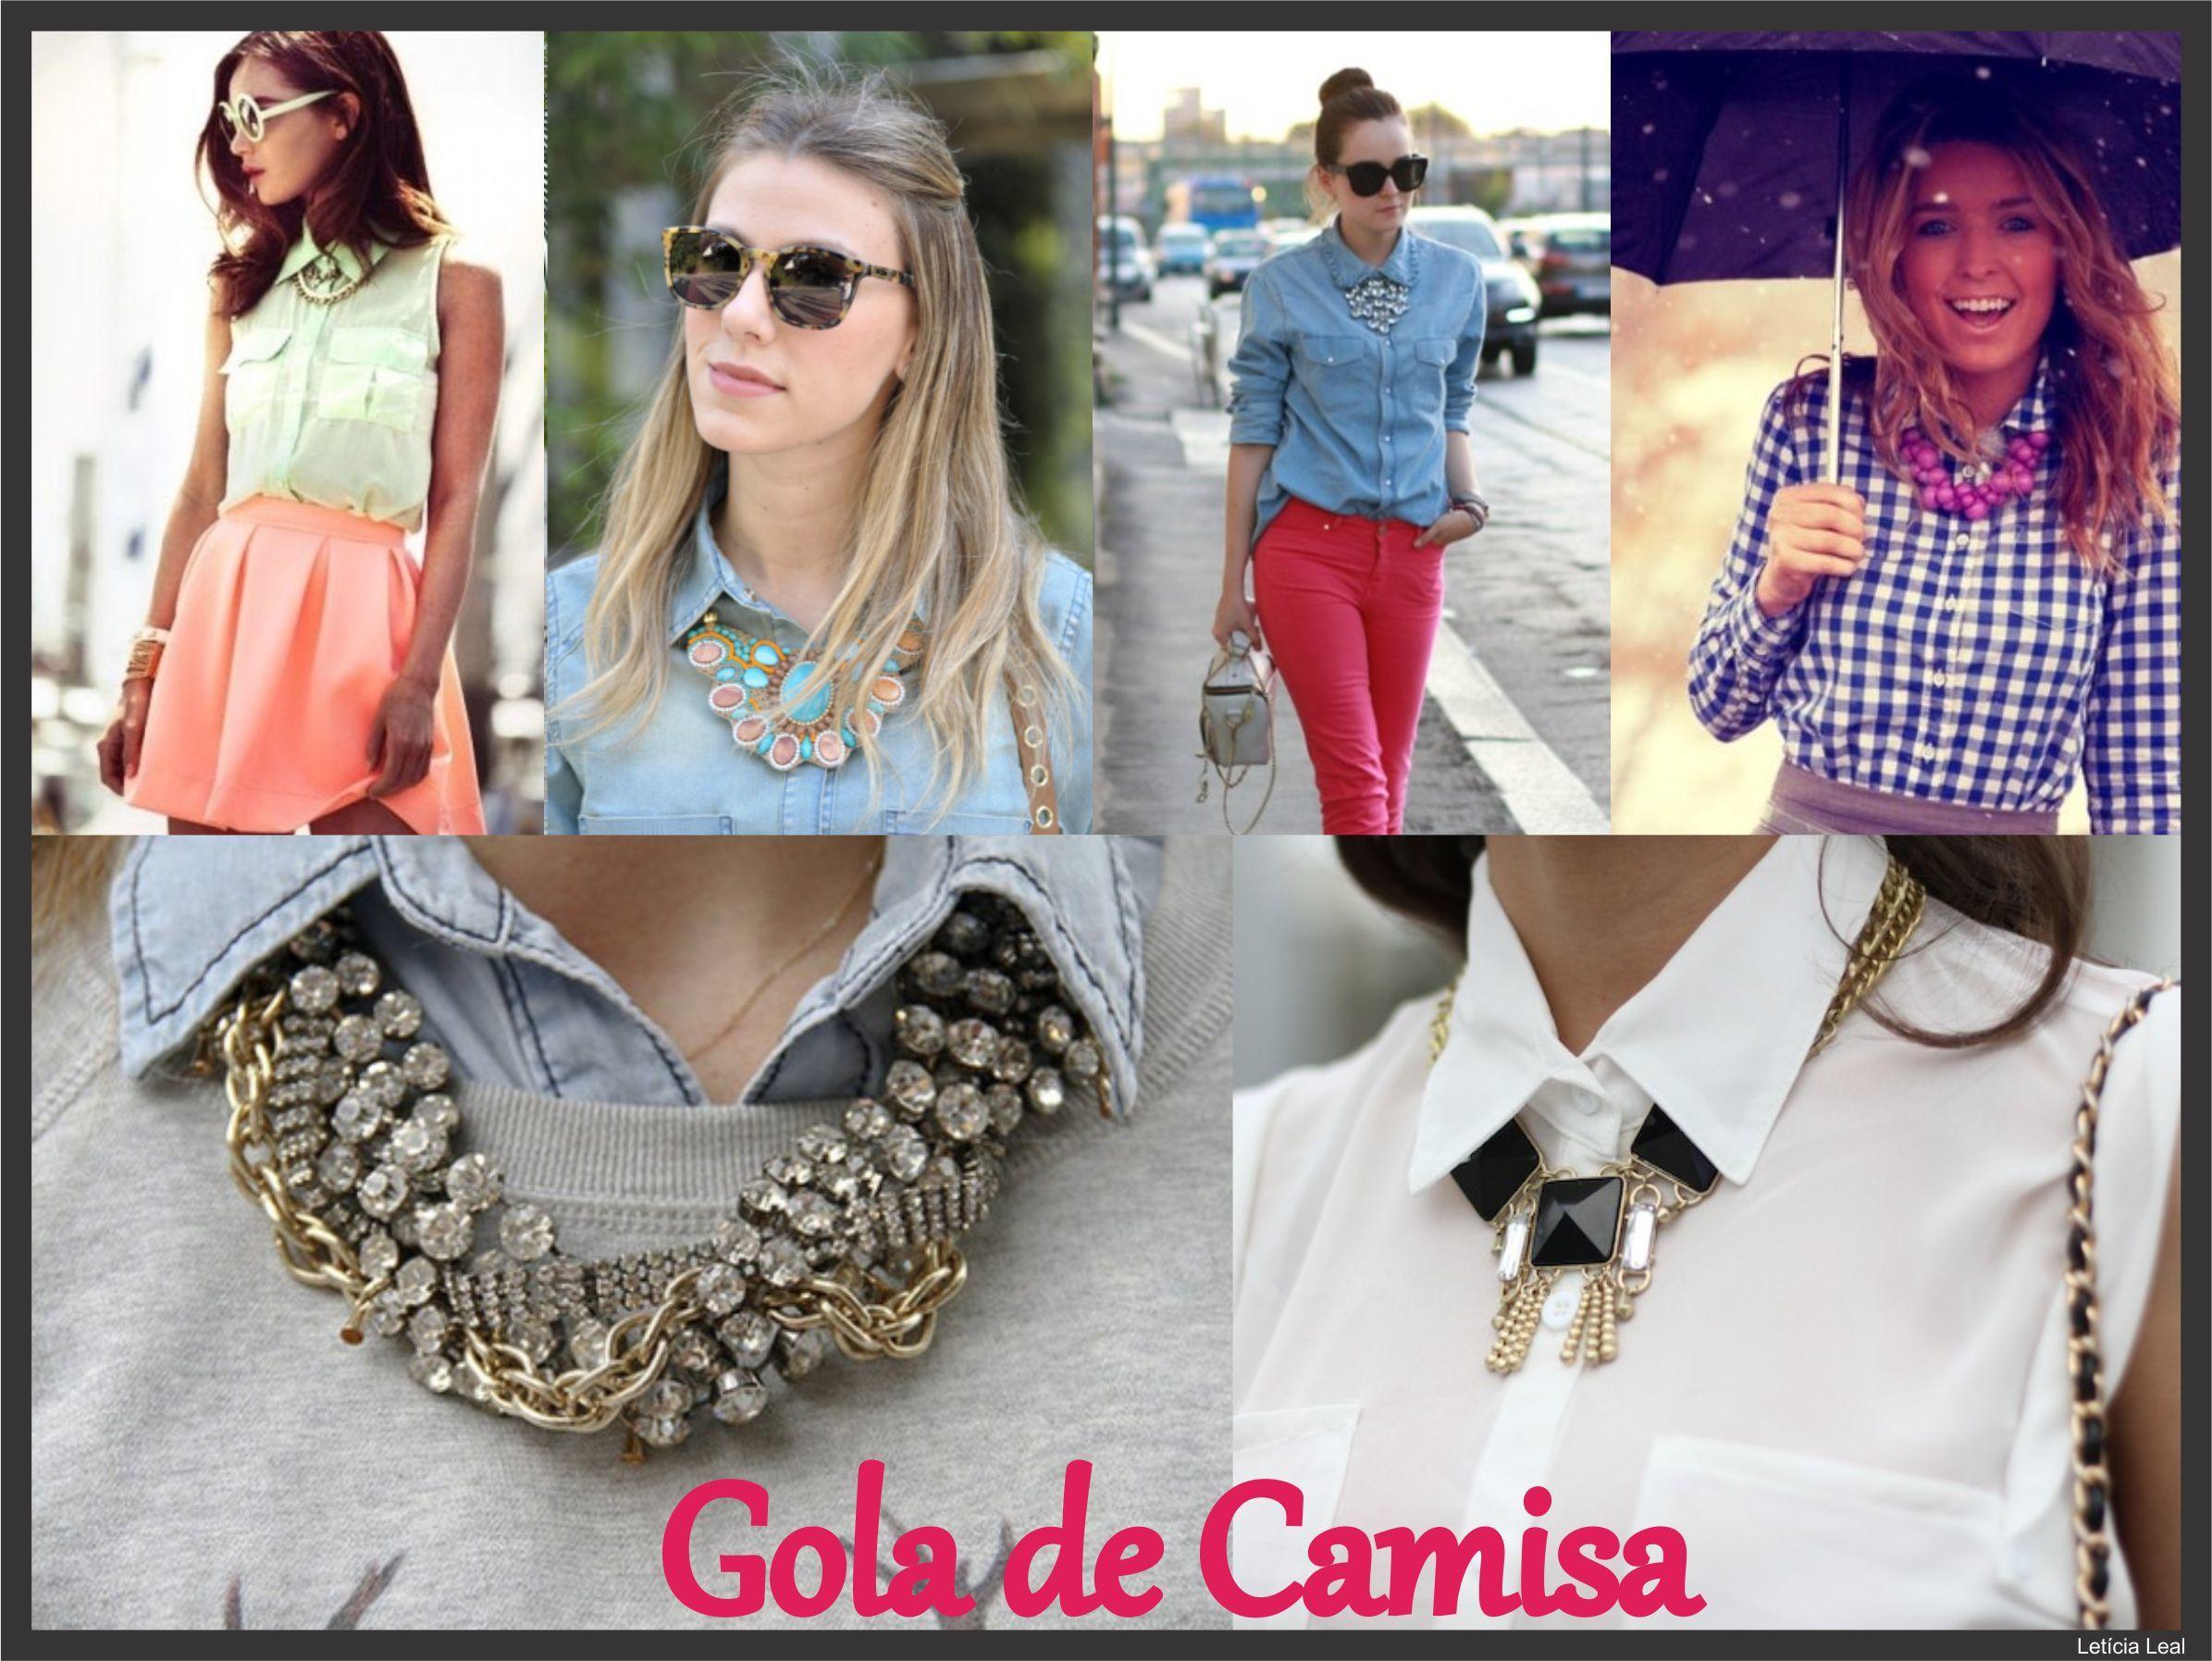 maxi_colar_por_cima_da_gola_de_camisa_sos_solteiro